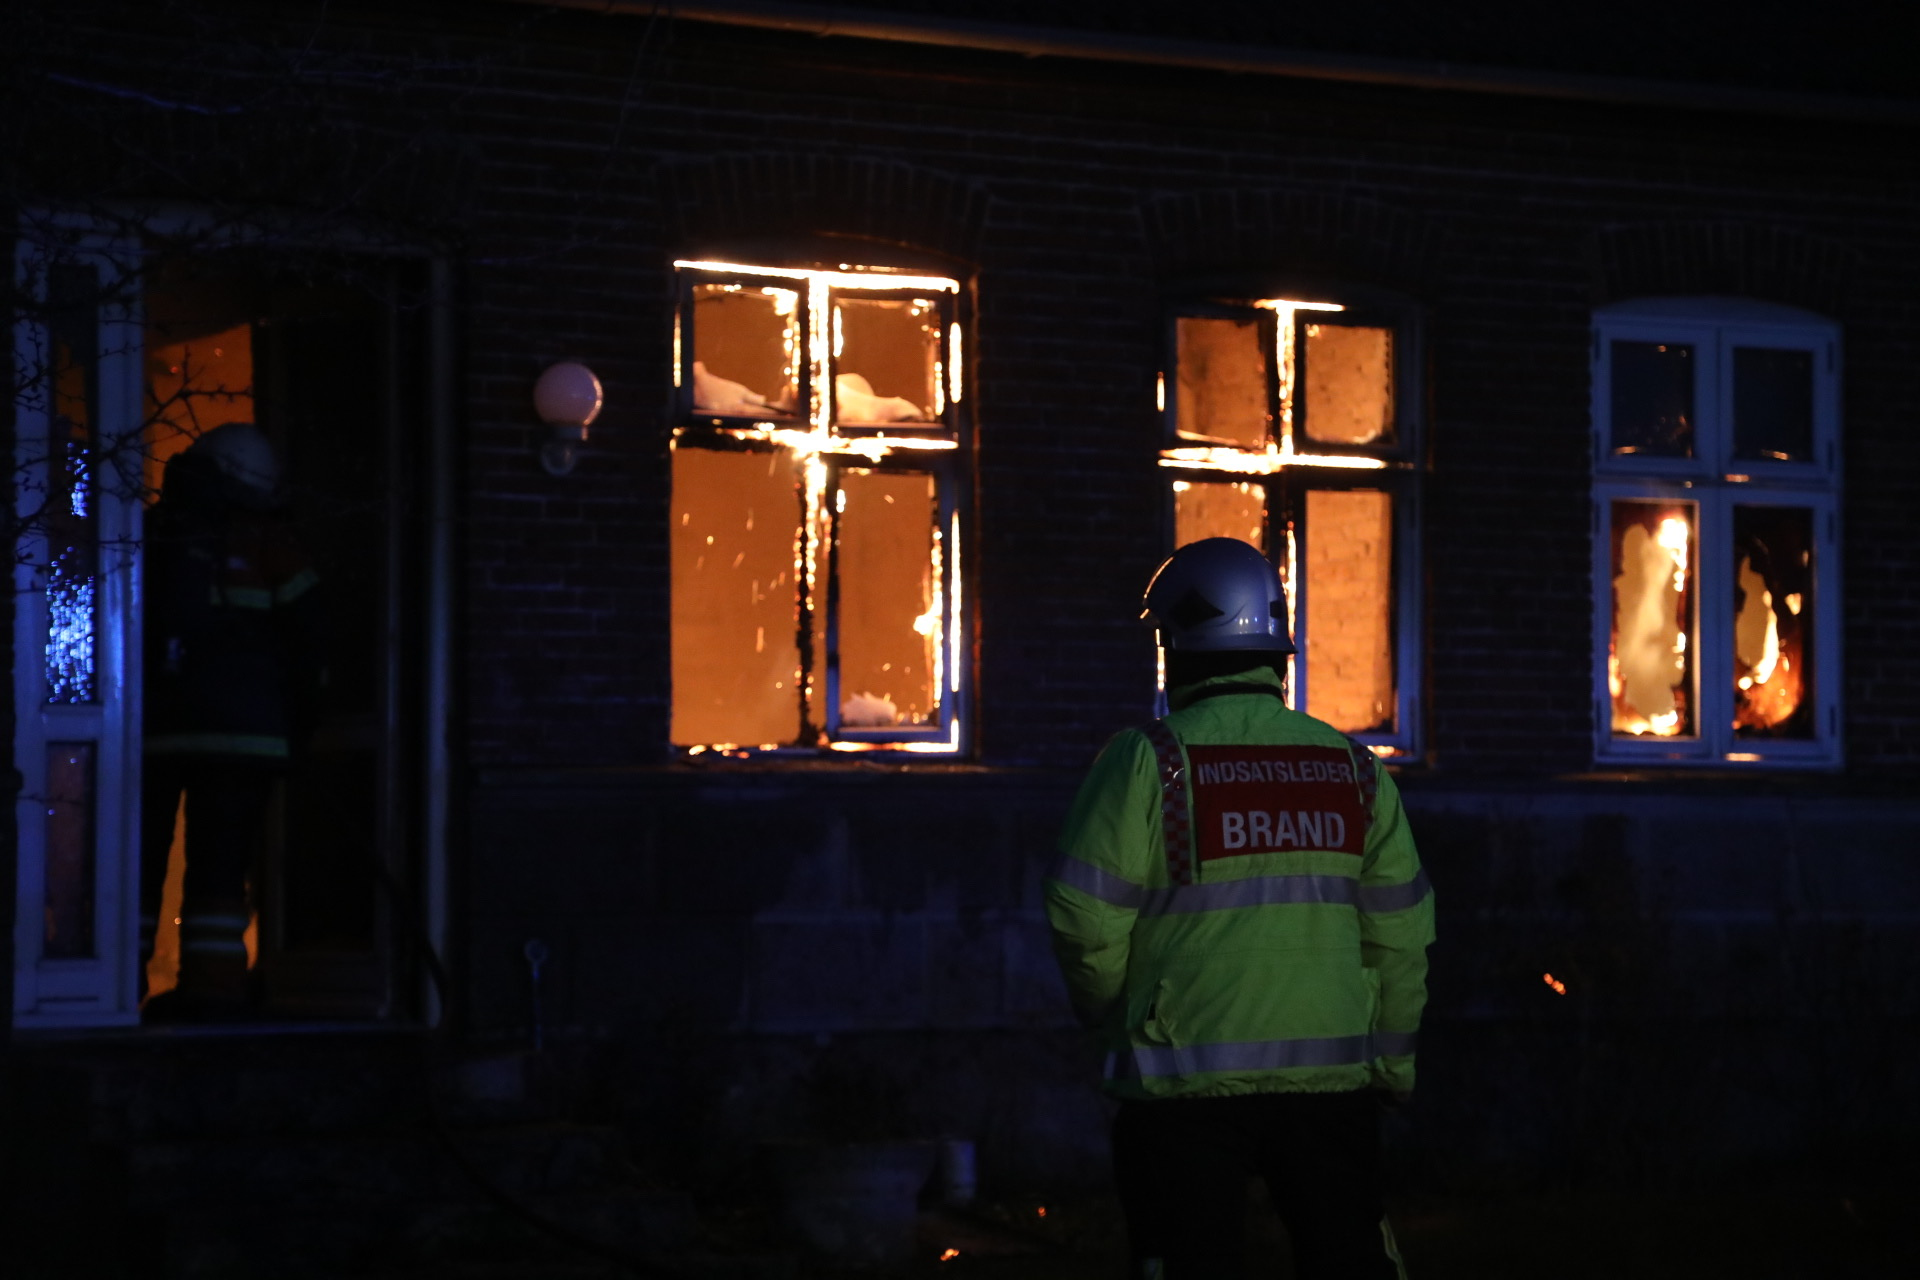 Voldsom villabrand i Tressebølle på Langeland